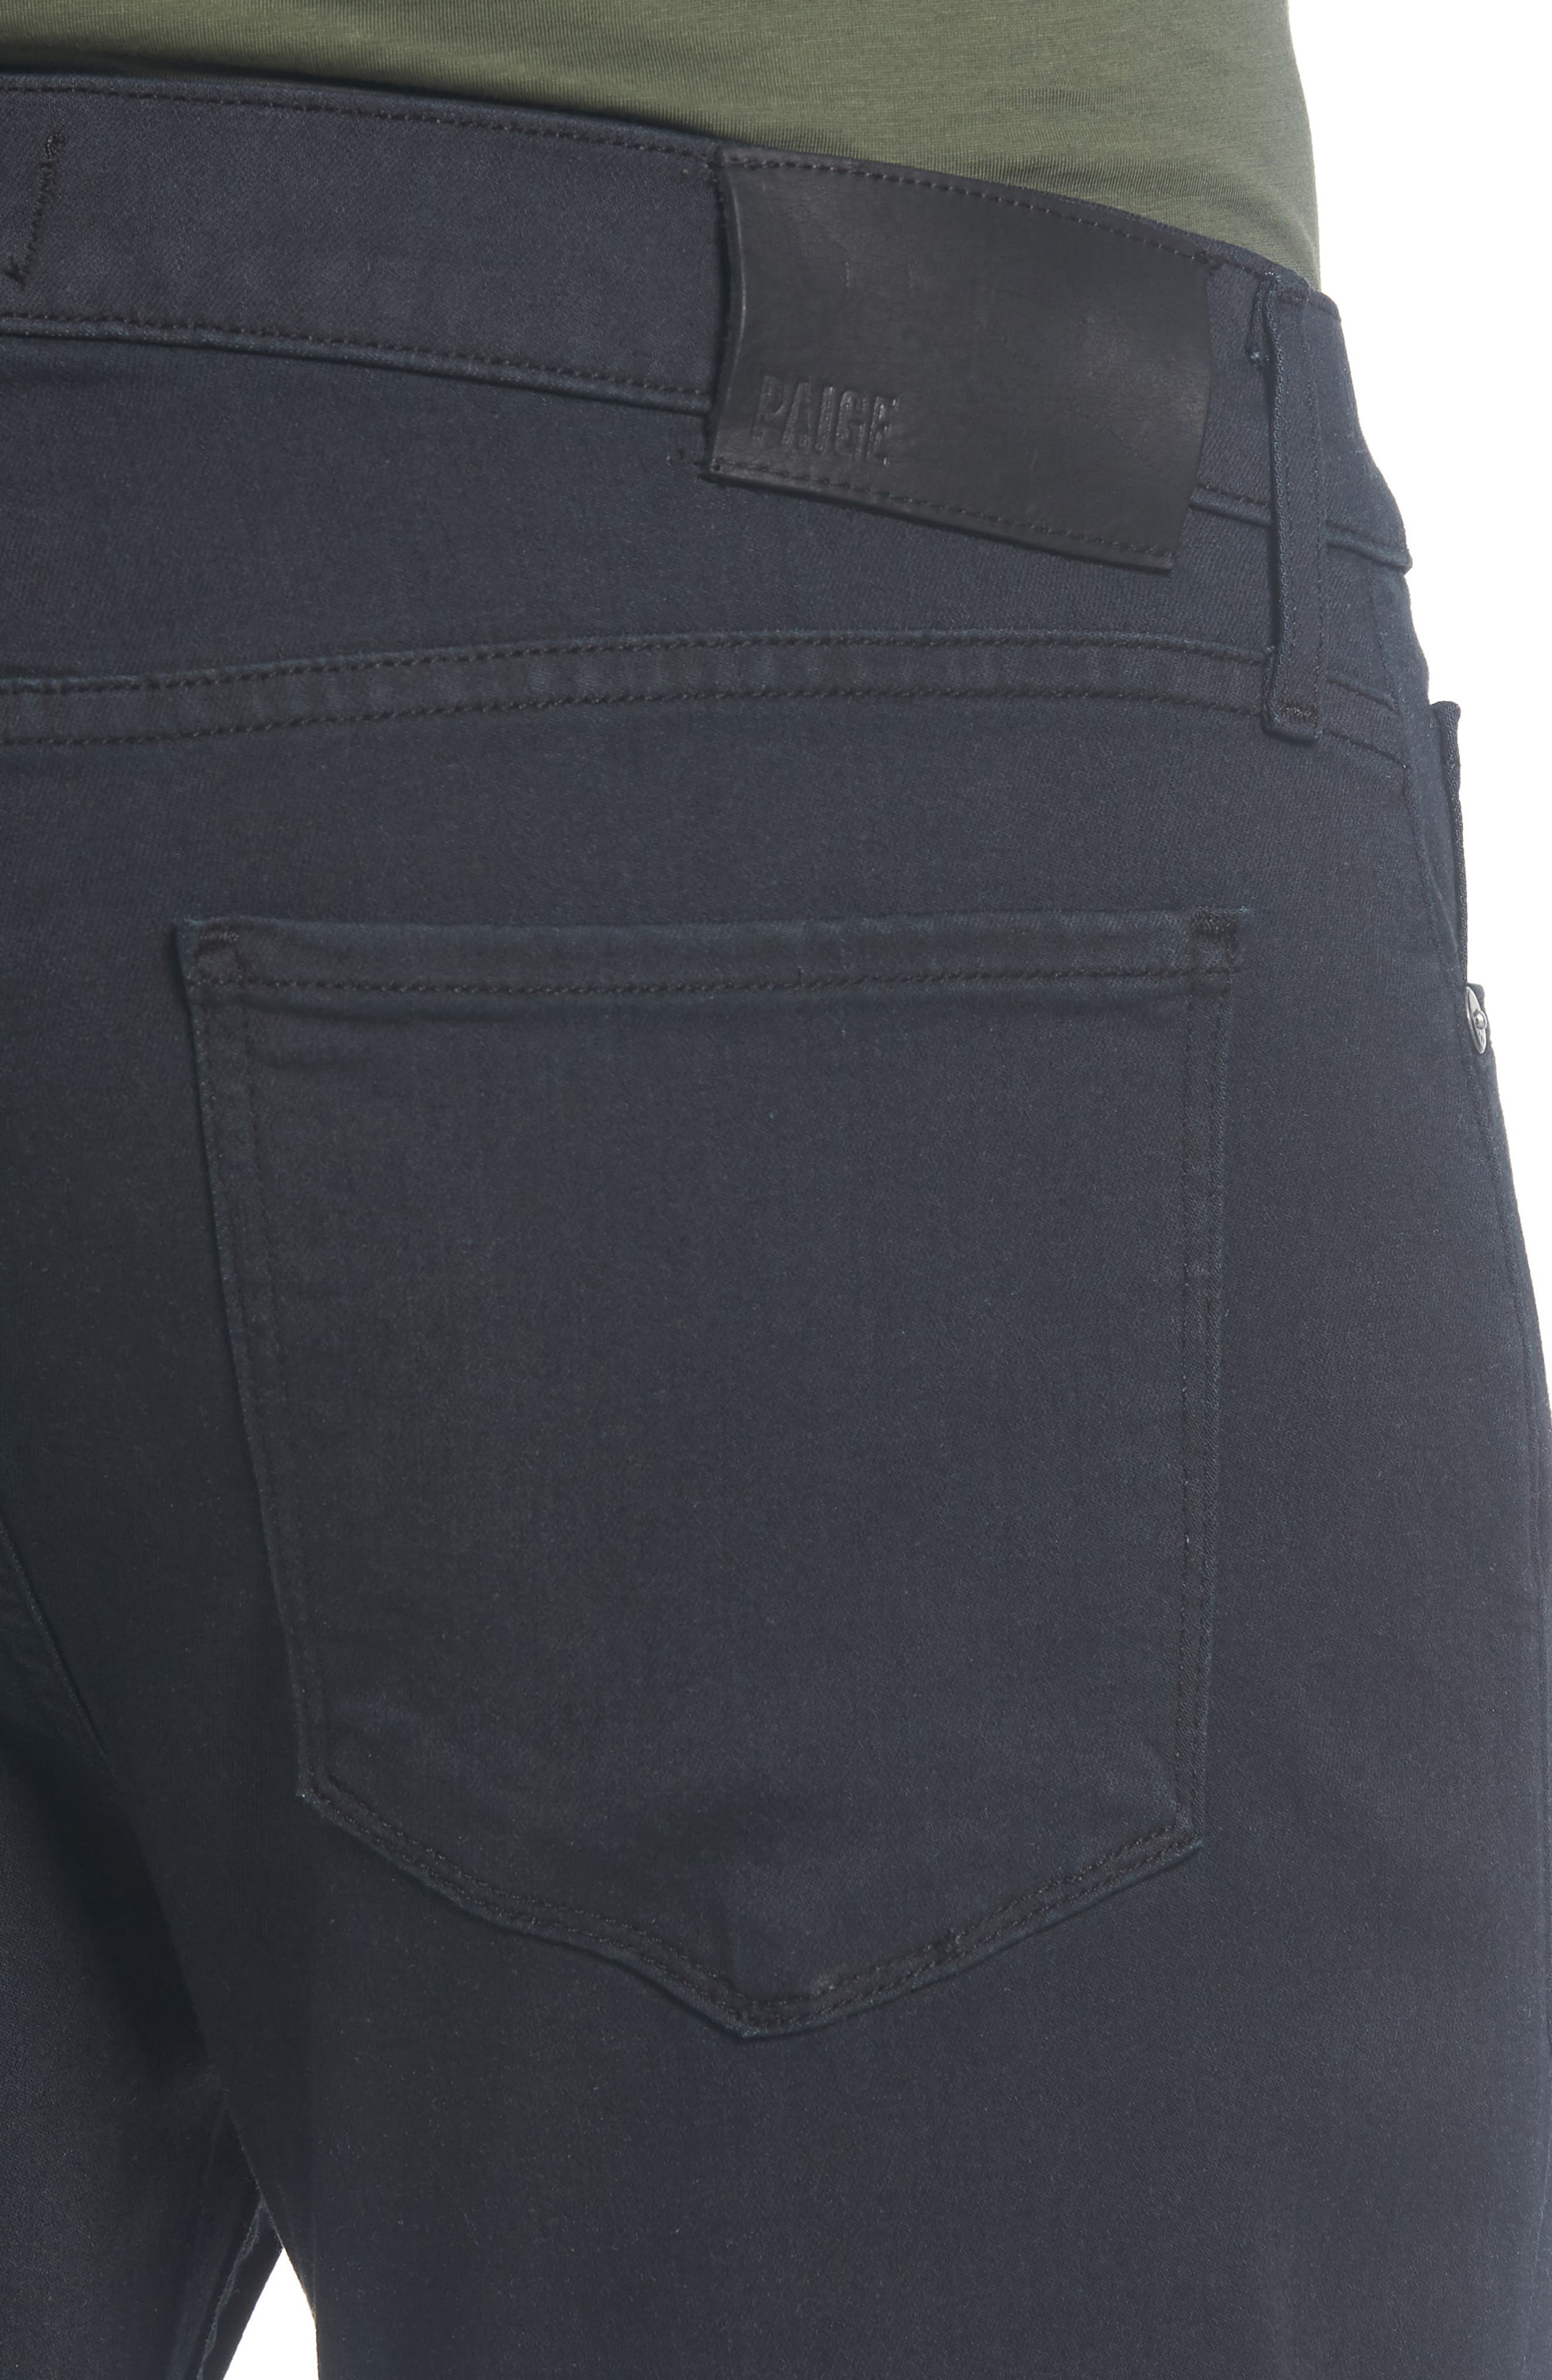 Normandie Straight Leg Jeans,                             Alternate thumbnail 4, color,                             Jeff